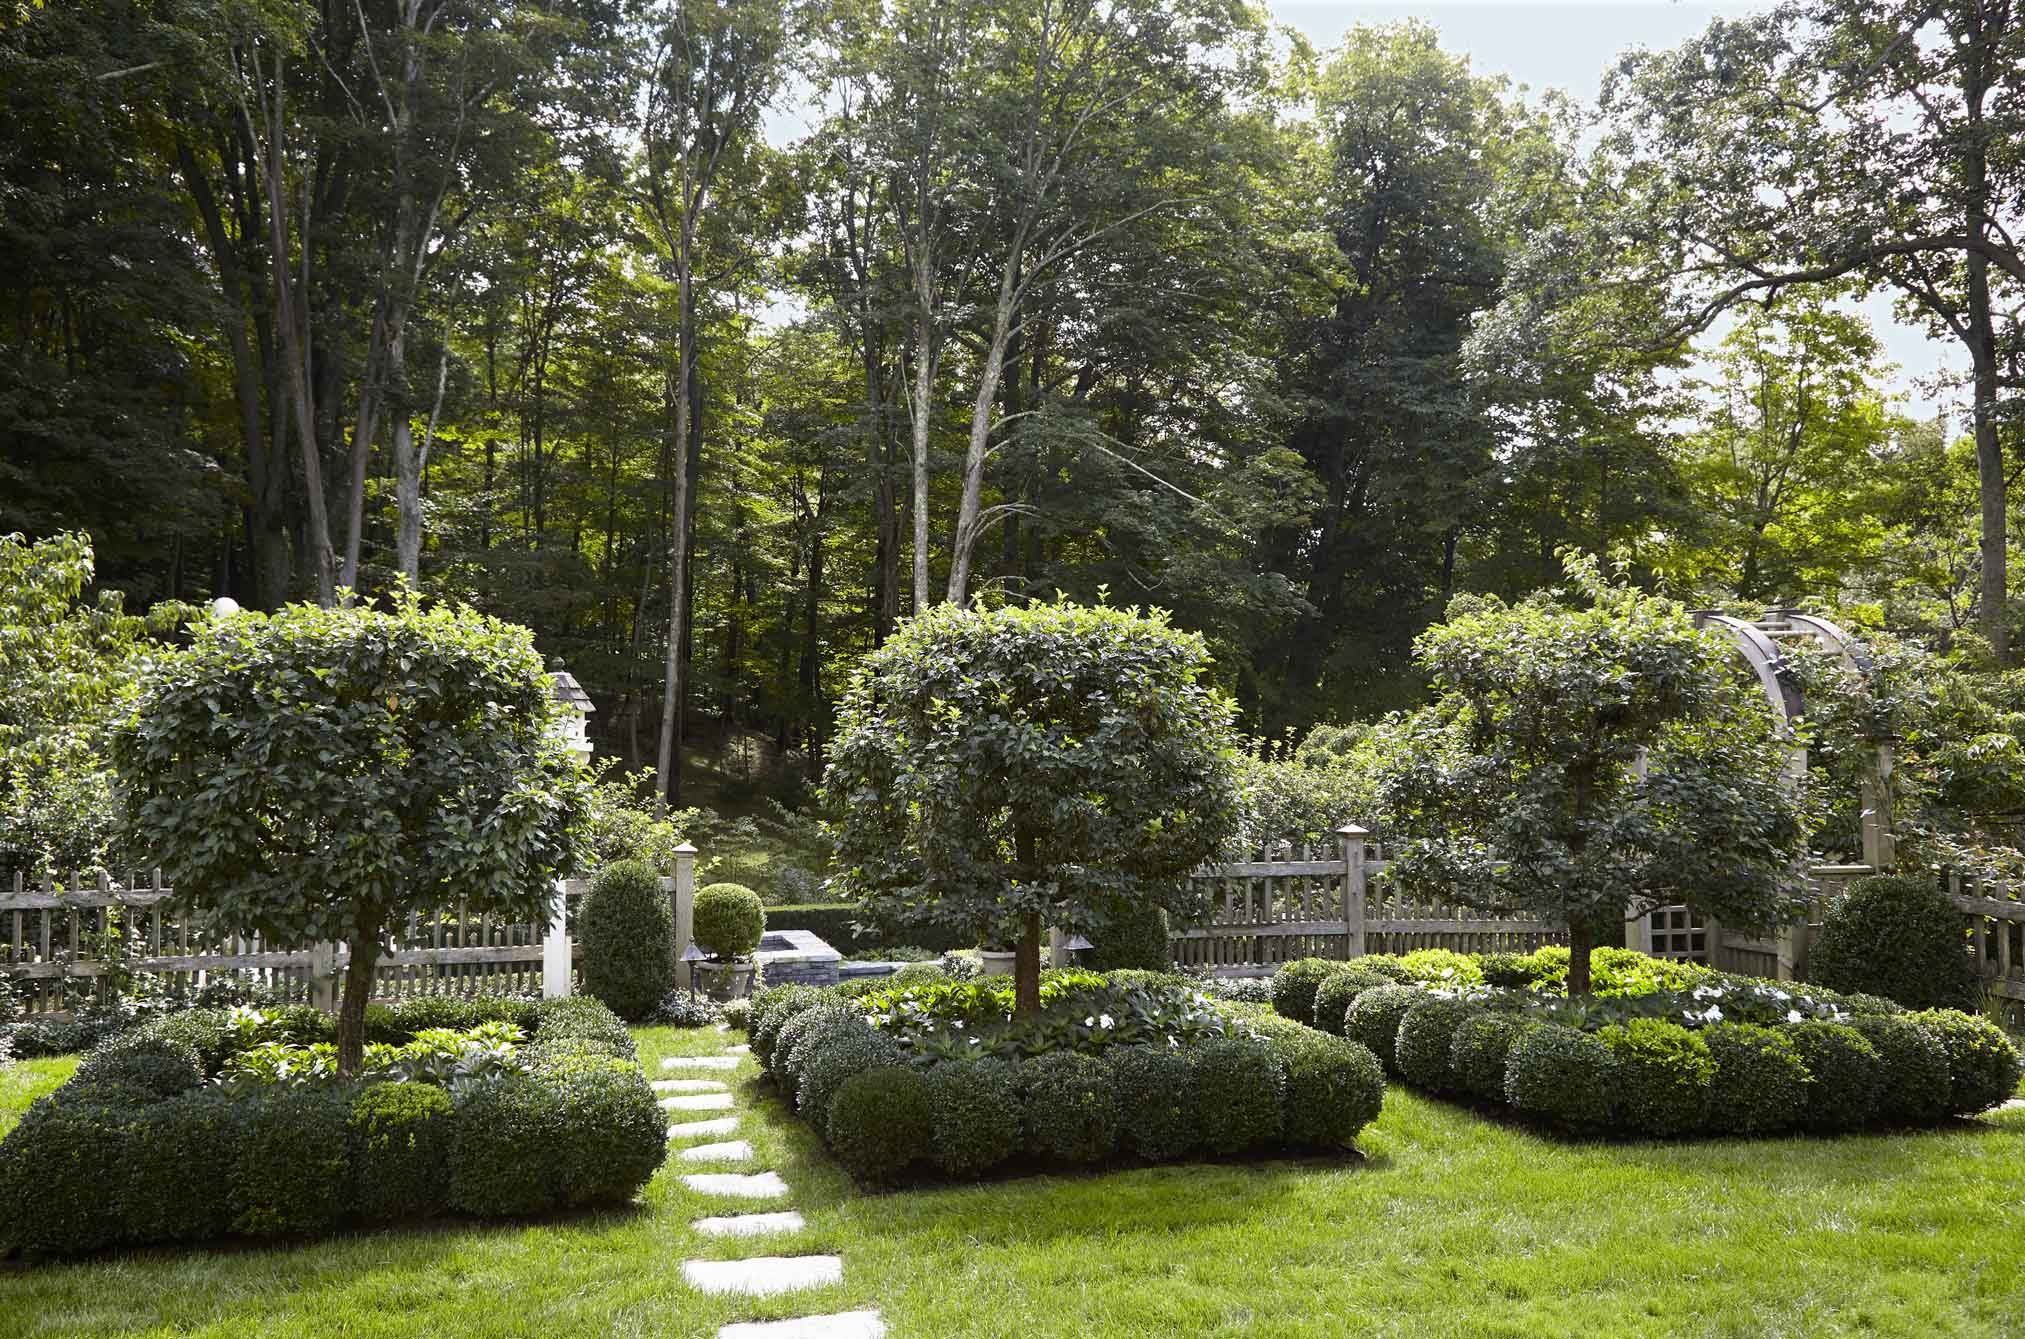 Best Landscaping Ideas 2021 Landscape Designs For Front Yards Backyards